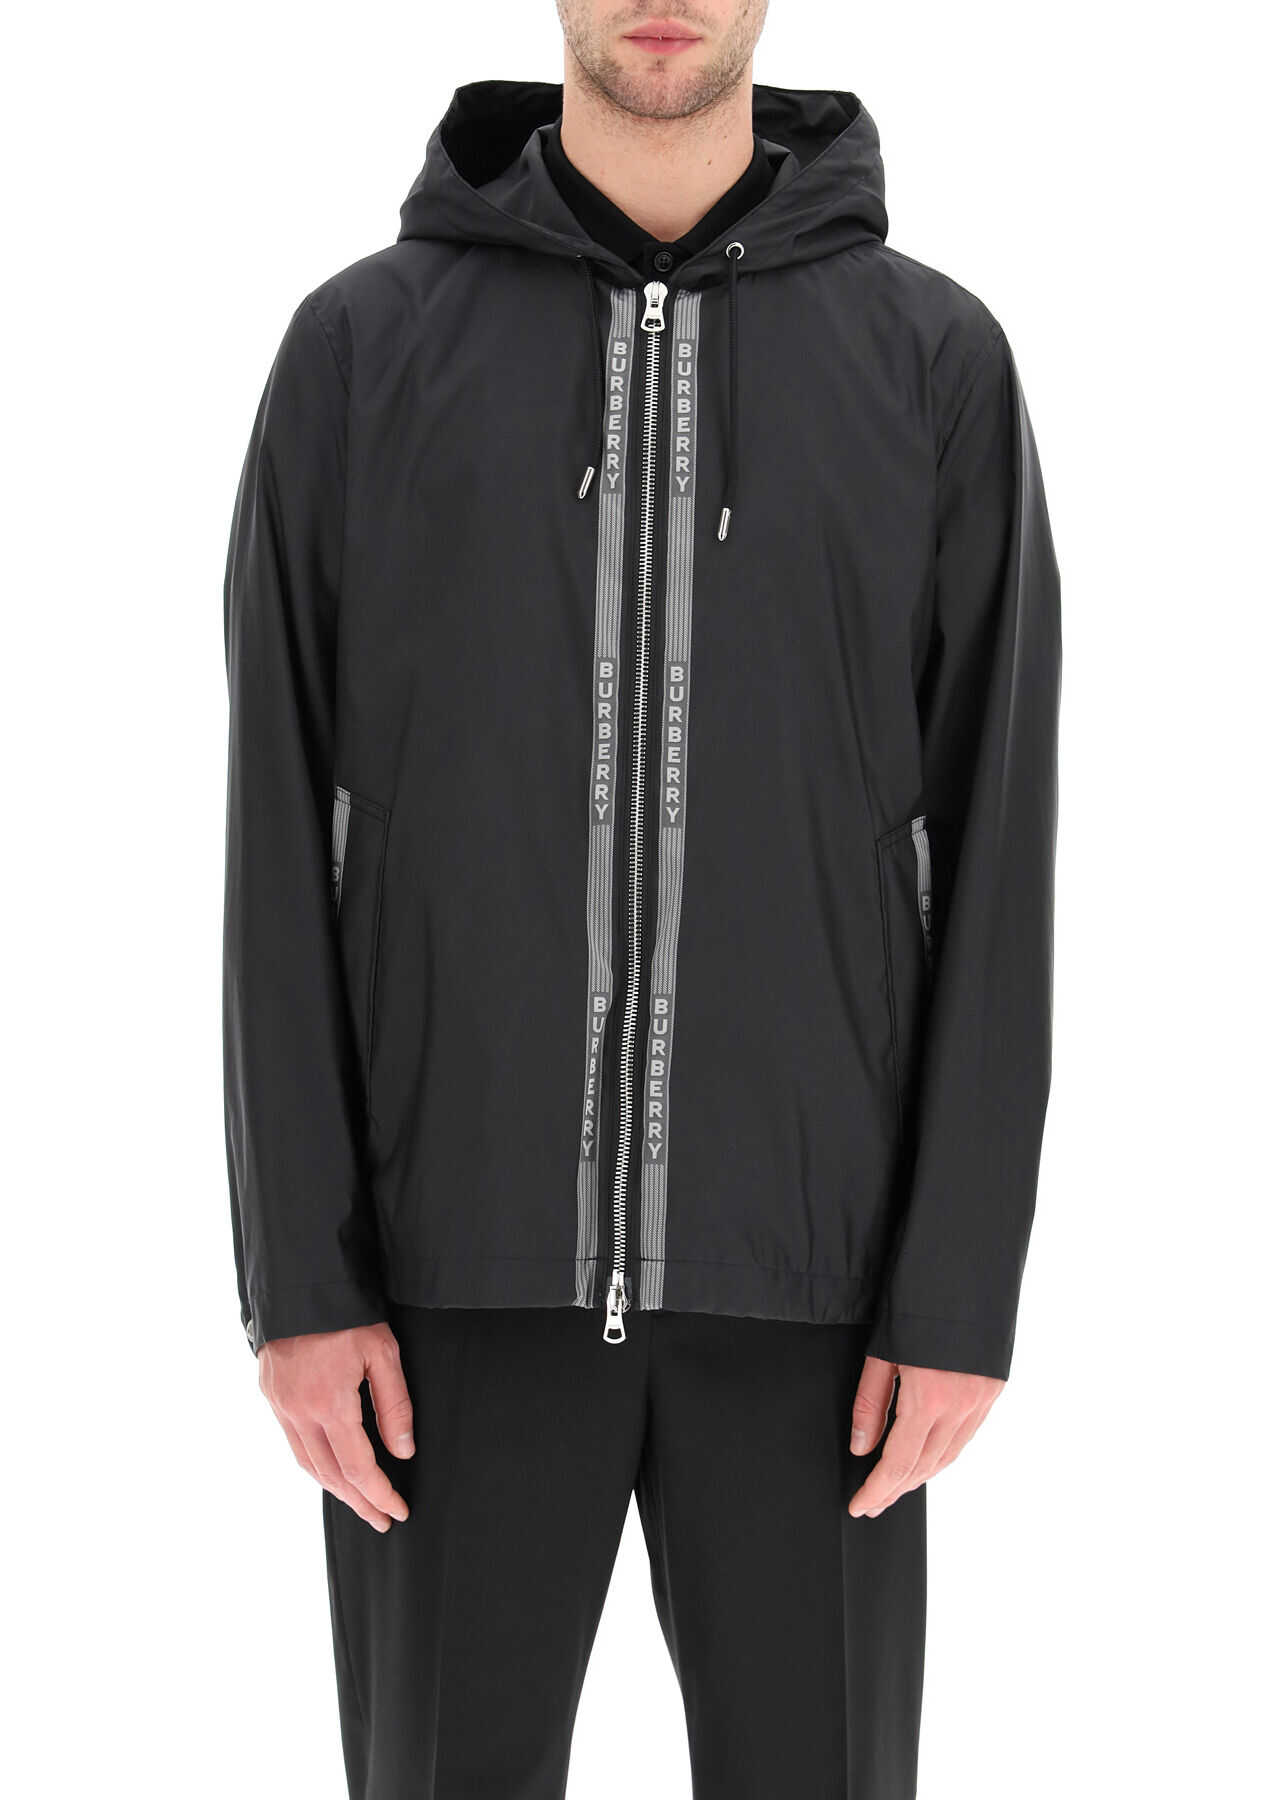 Burberry Stretton Nylon Jacket With Logo BLACK imagine